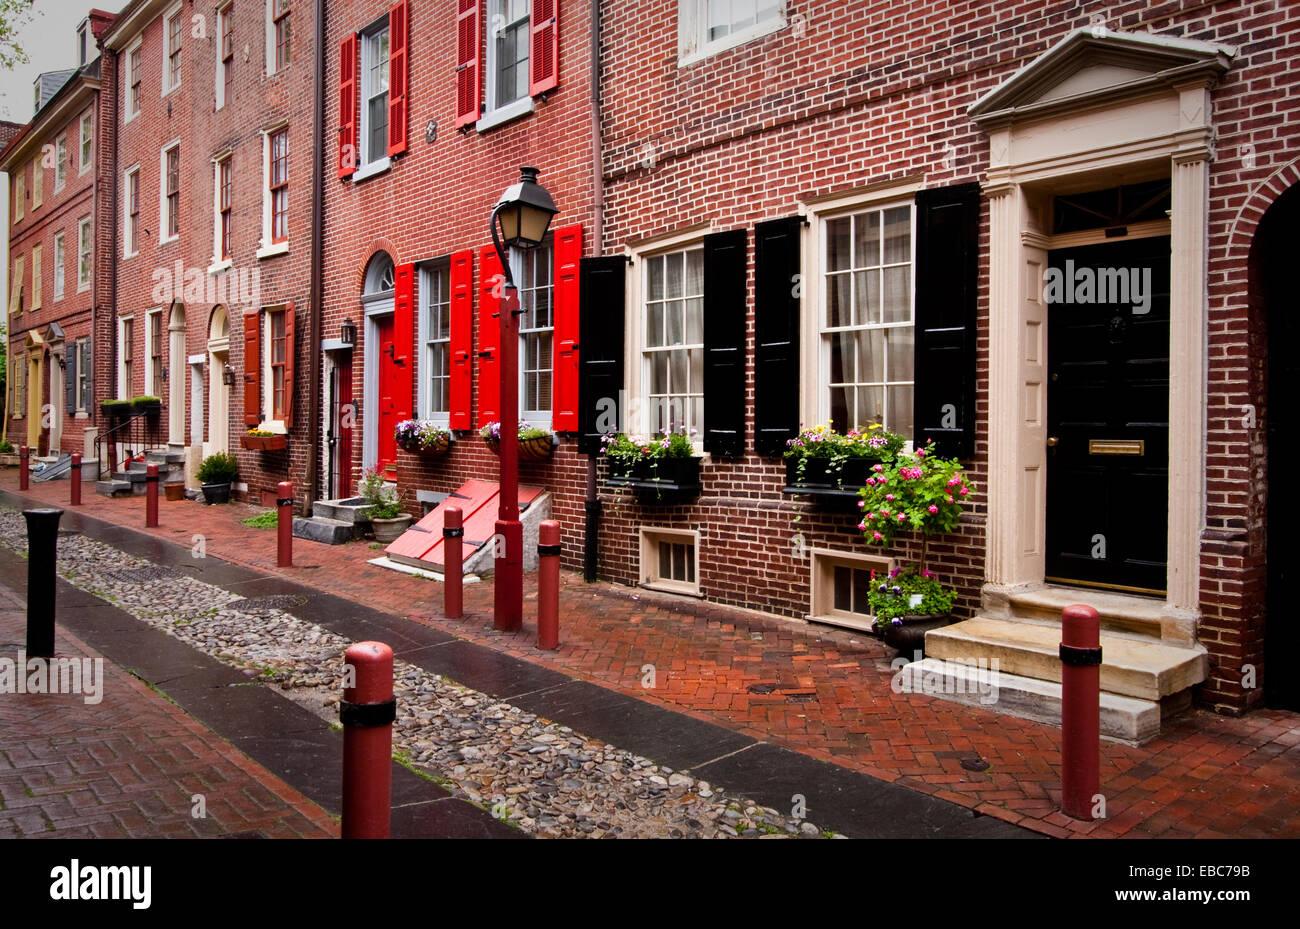 Oldest Street In Philadelphia Stock Photos & Oldest Street ...